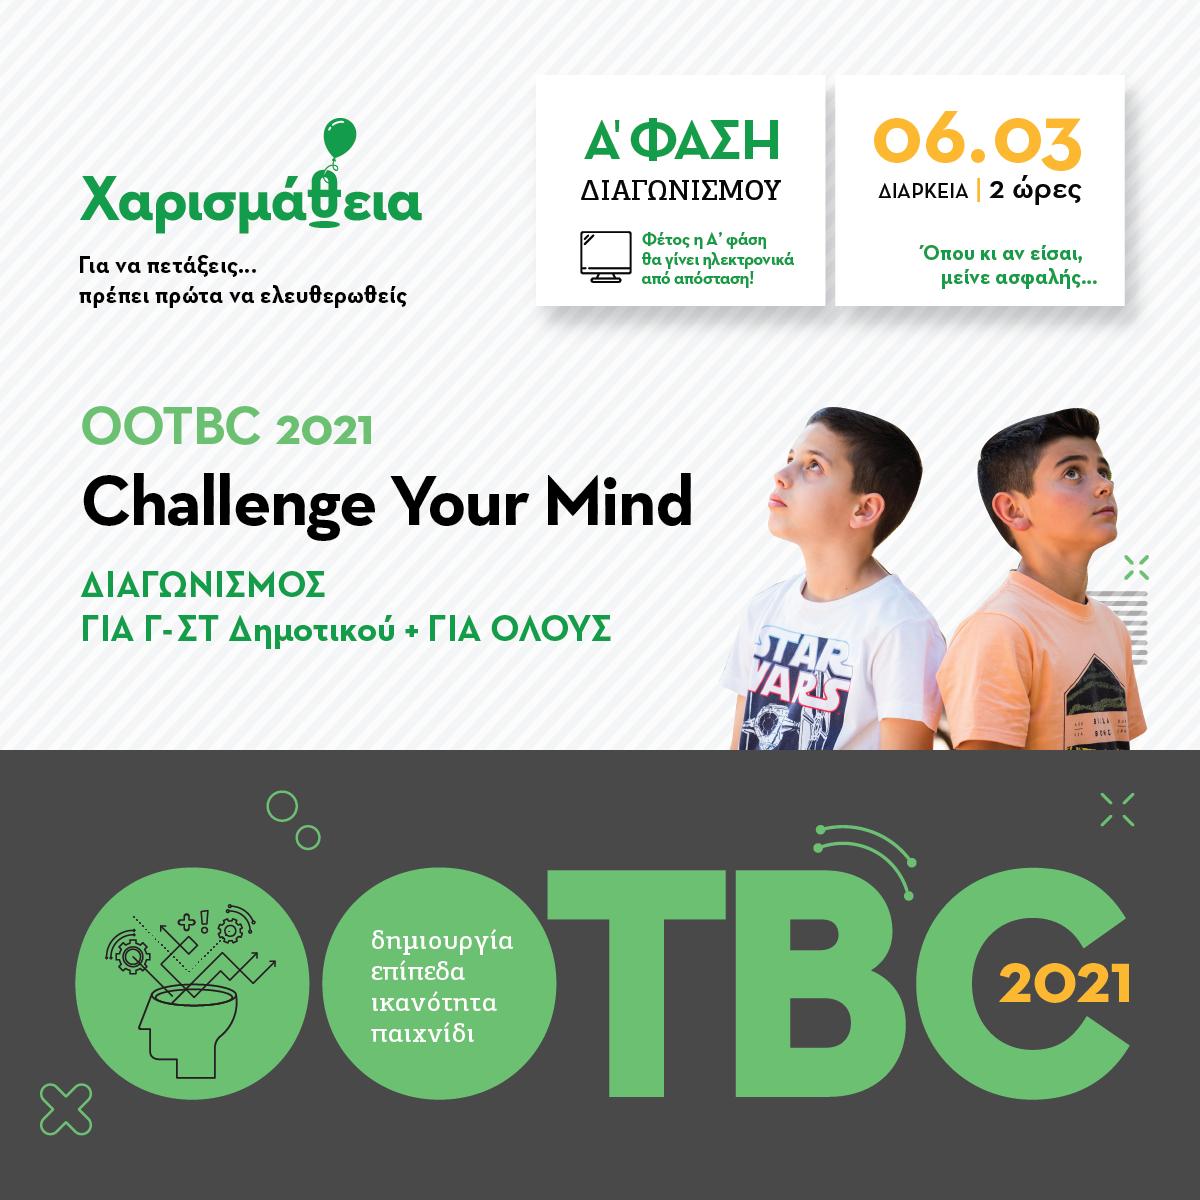 Out of the Box Challenge 2021: Παιδιά, δηλώστε συμμετοχή στον ετήσιο μαθητικό διαγωνισμό φαντασίας και γρίφων λογικής!